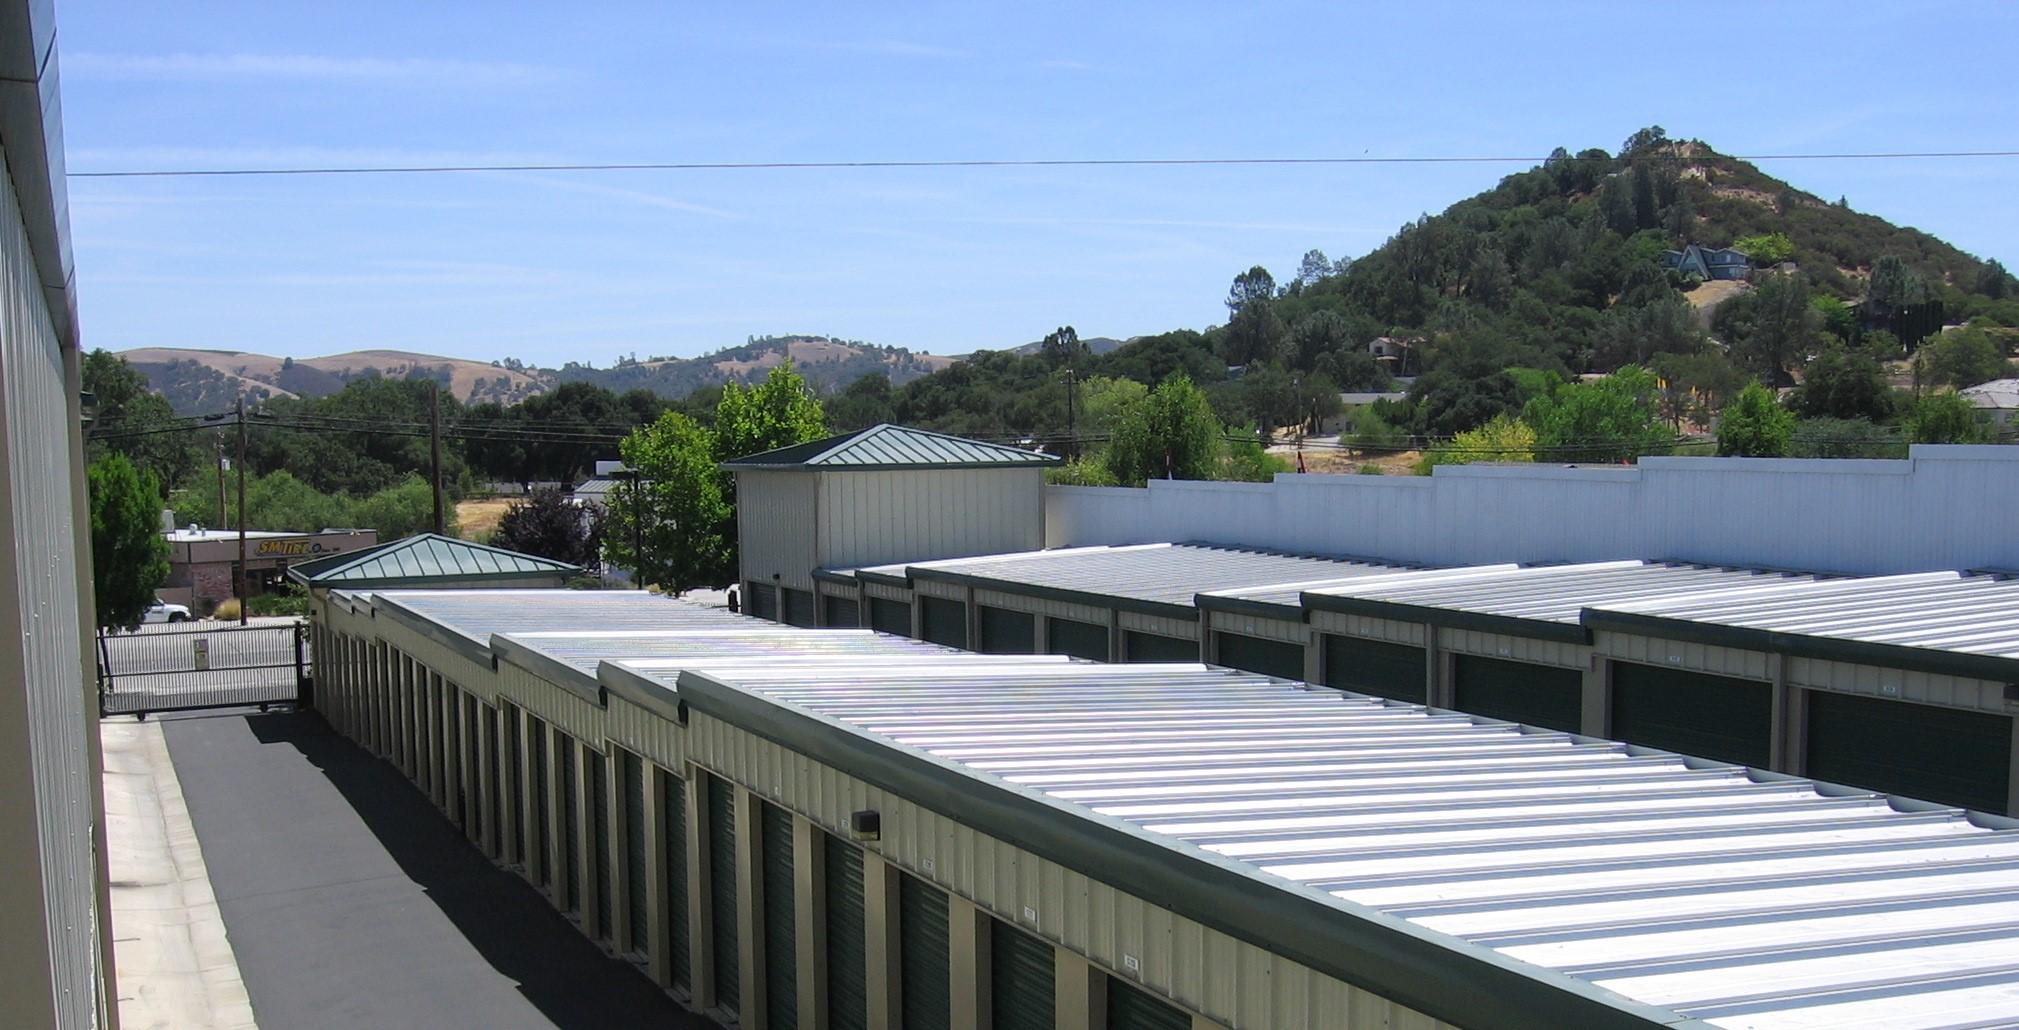 Self Storage in Atascadero, CA